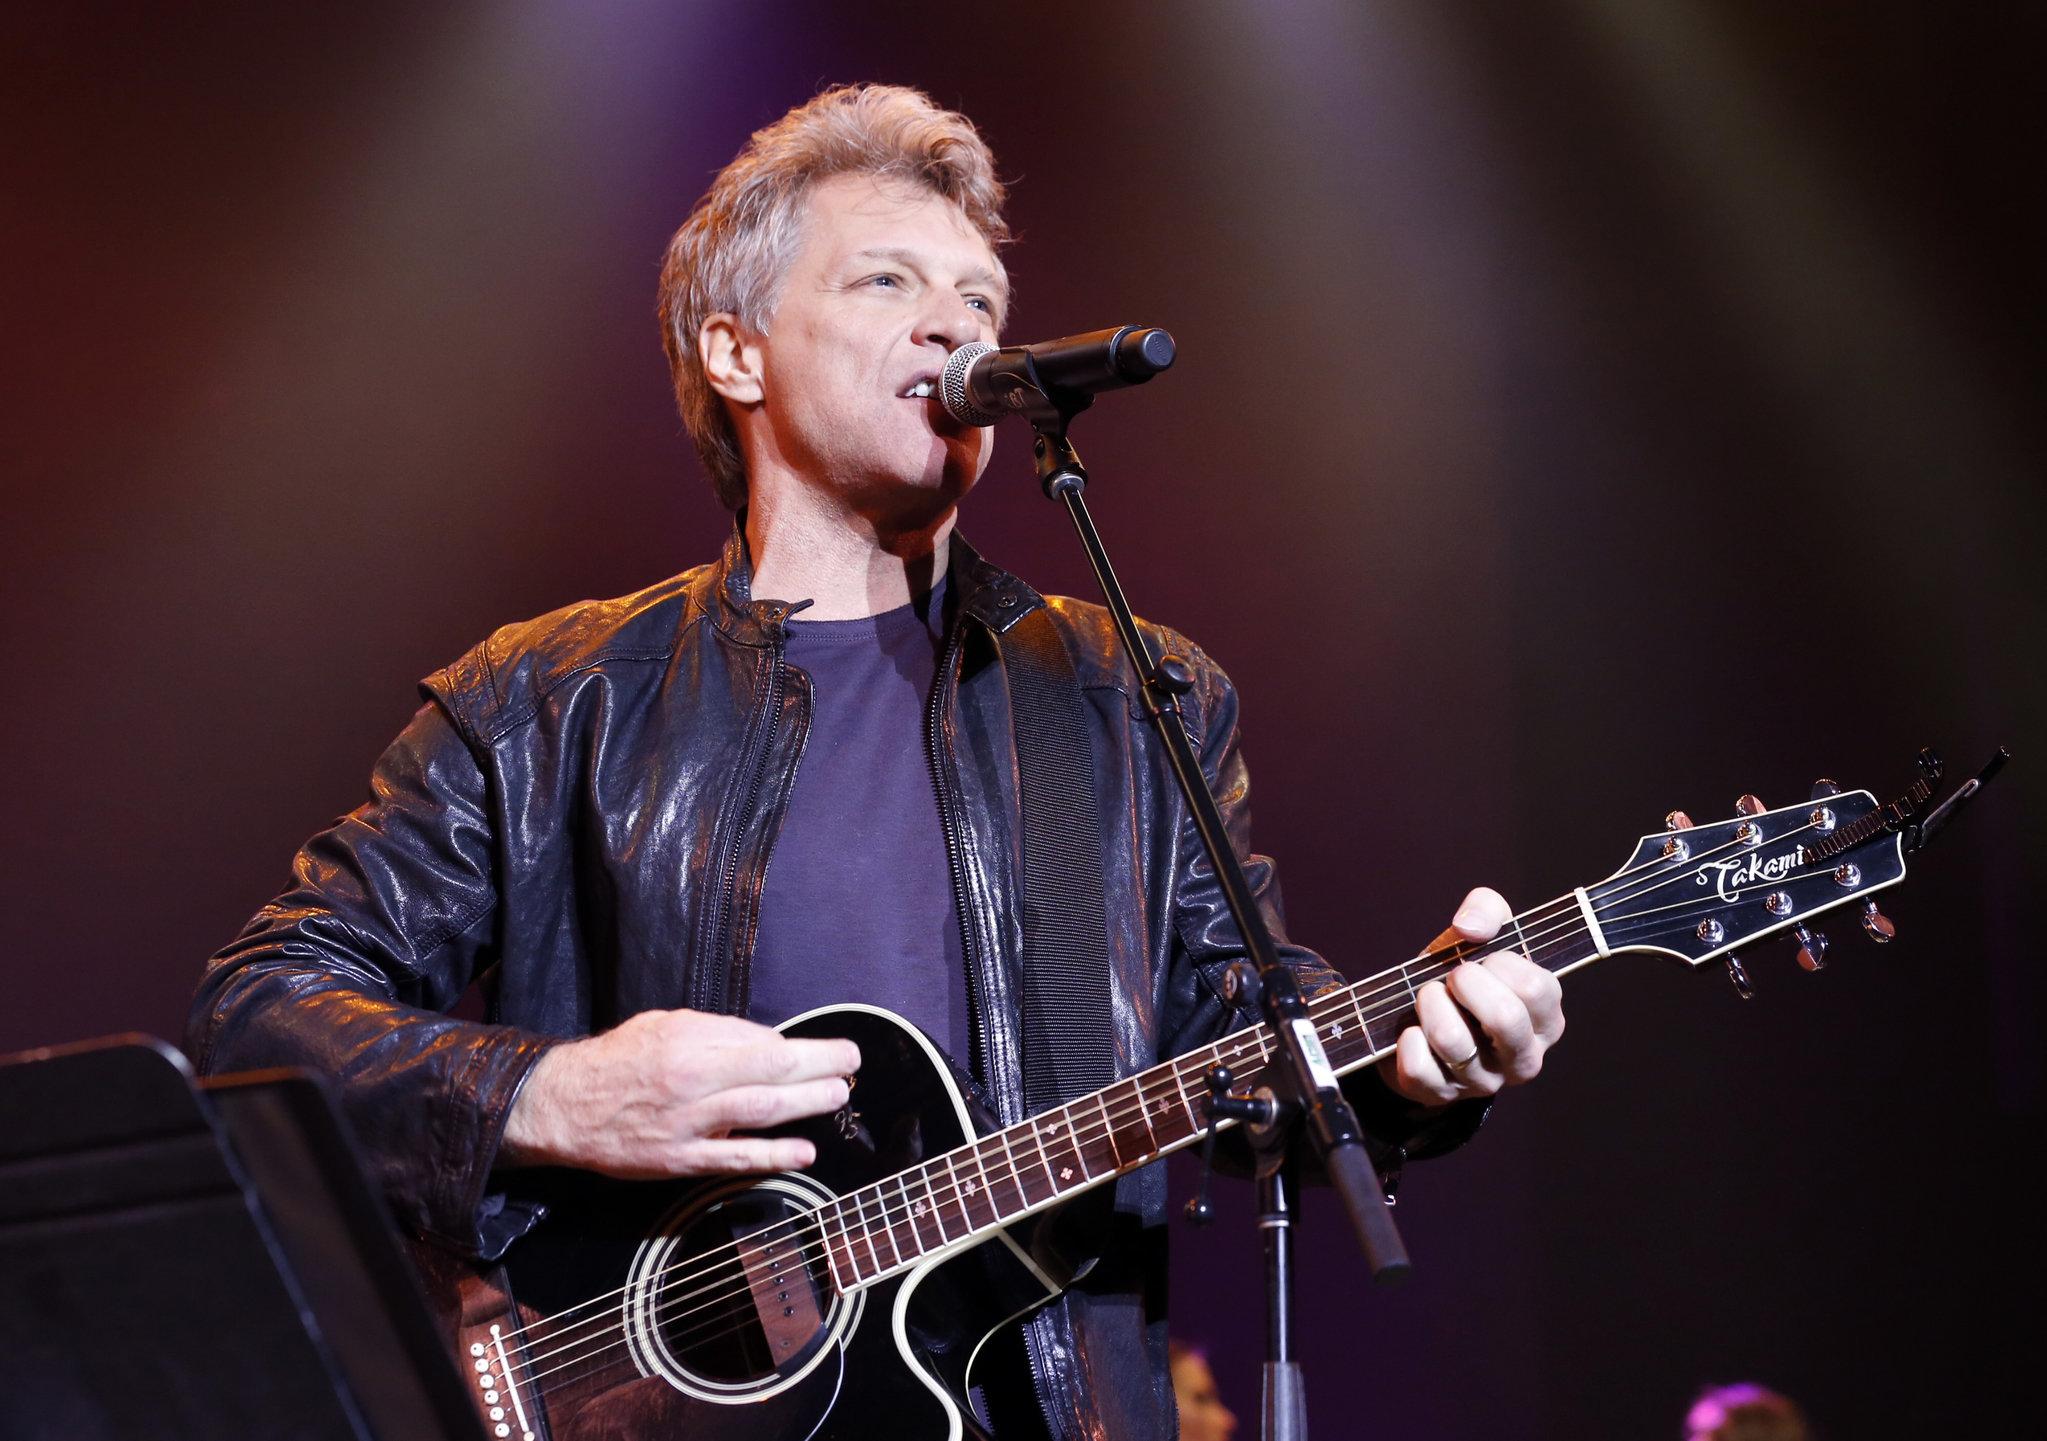 John Bon Jovi tour was the most profitable in 2013 12/16/2013 54